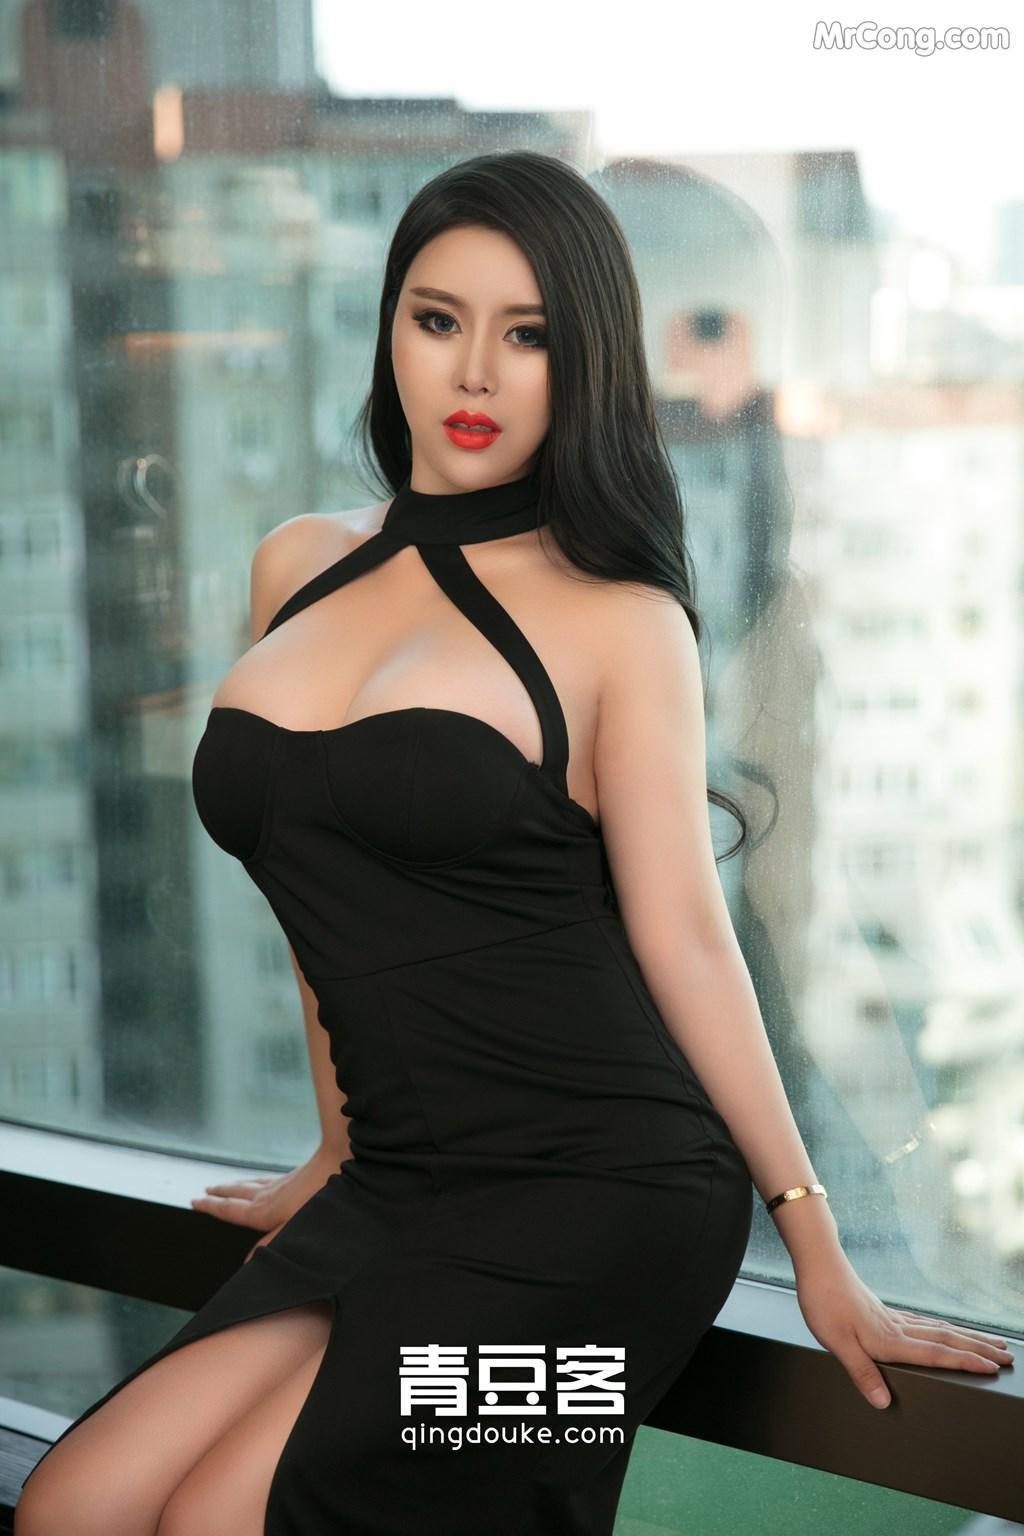 Image QingDouKe-2017-11-05-Ke-Rui-Na-MrCong.com-010 in post QingDouKe 2017-11-05: Người mẫu Ke Rui Na (可蕊娜) (48 ảnh)